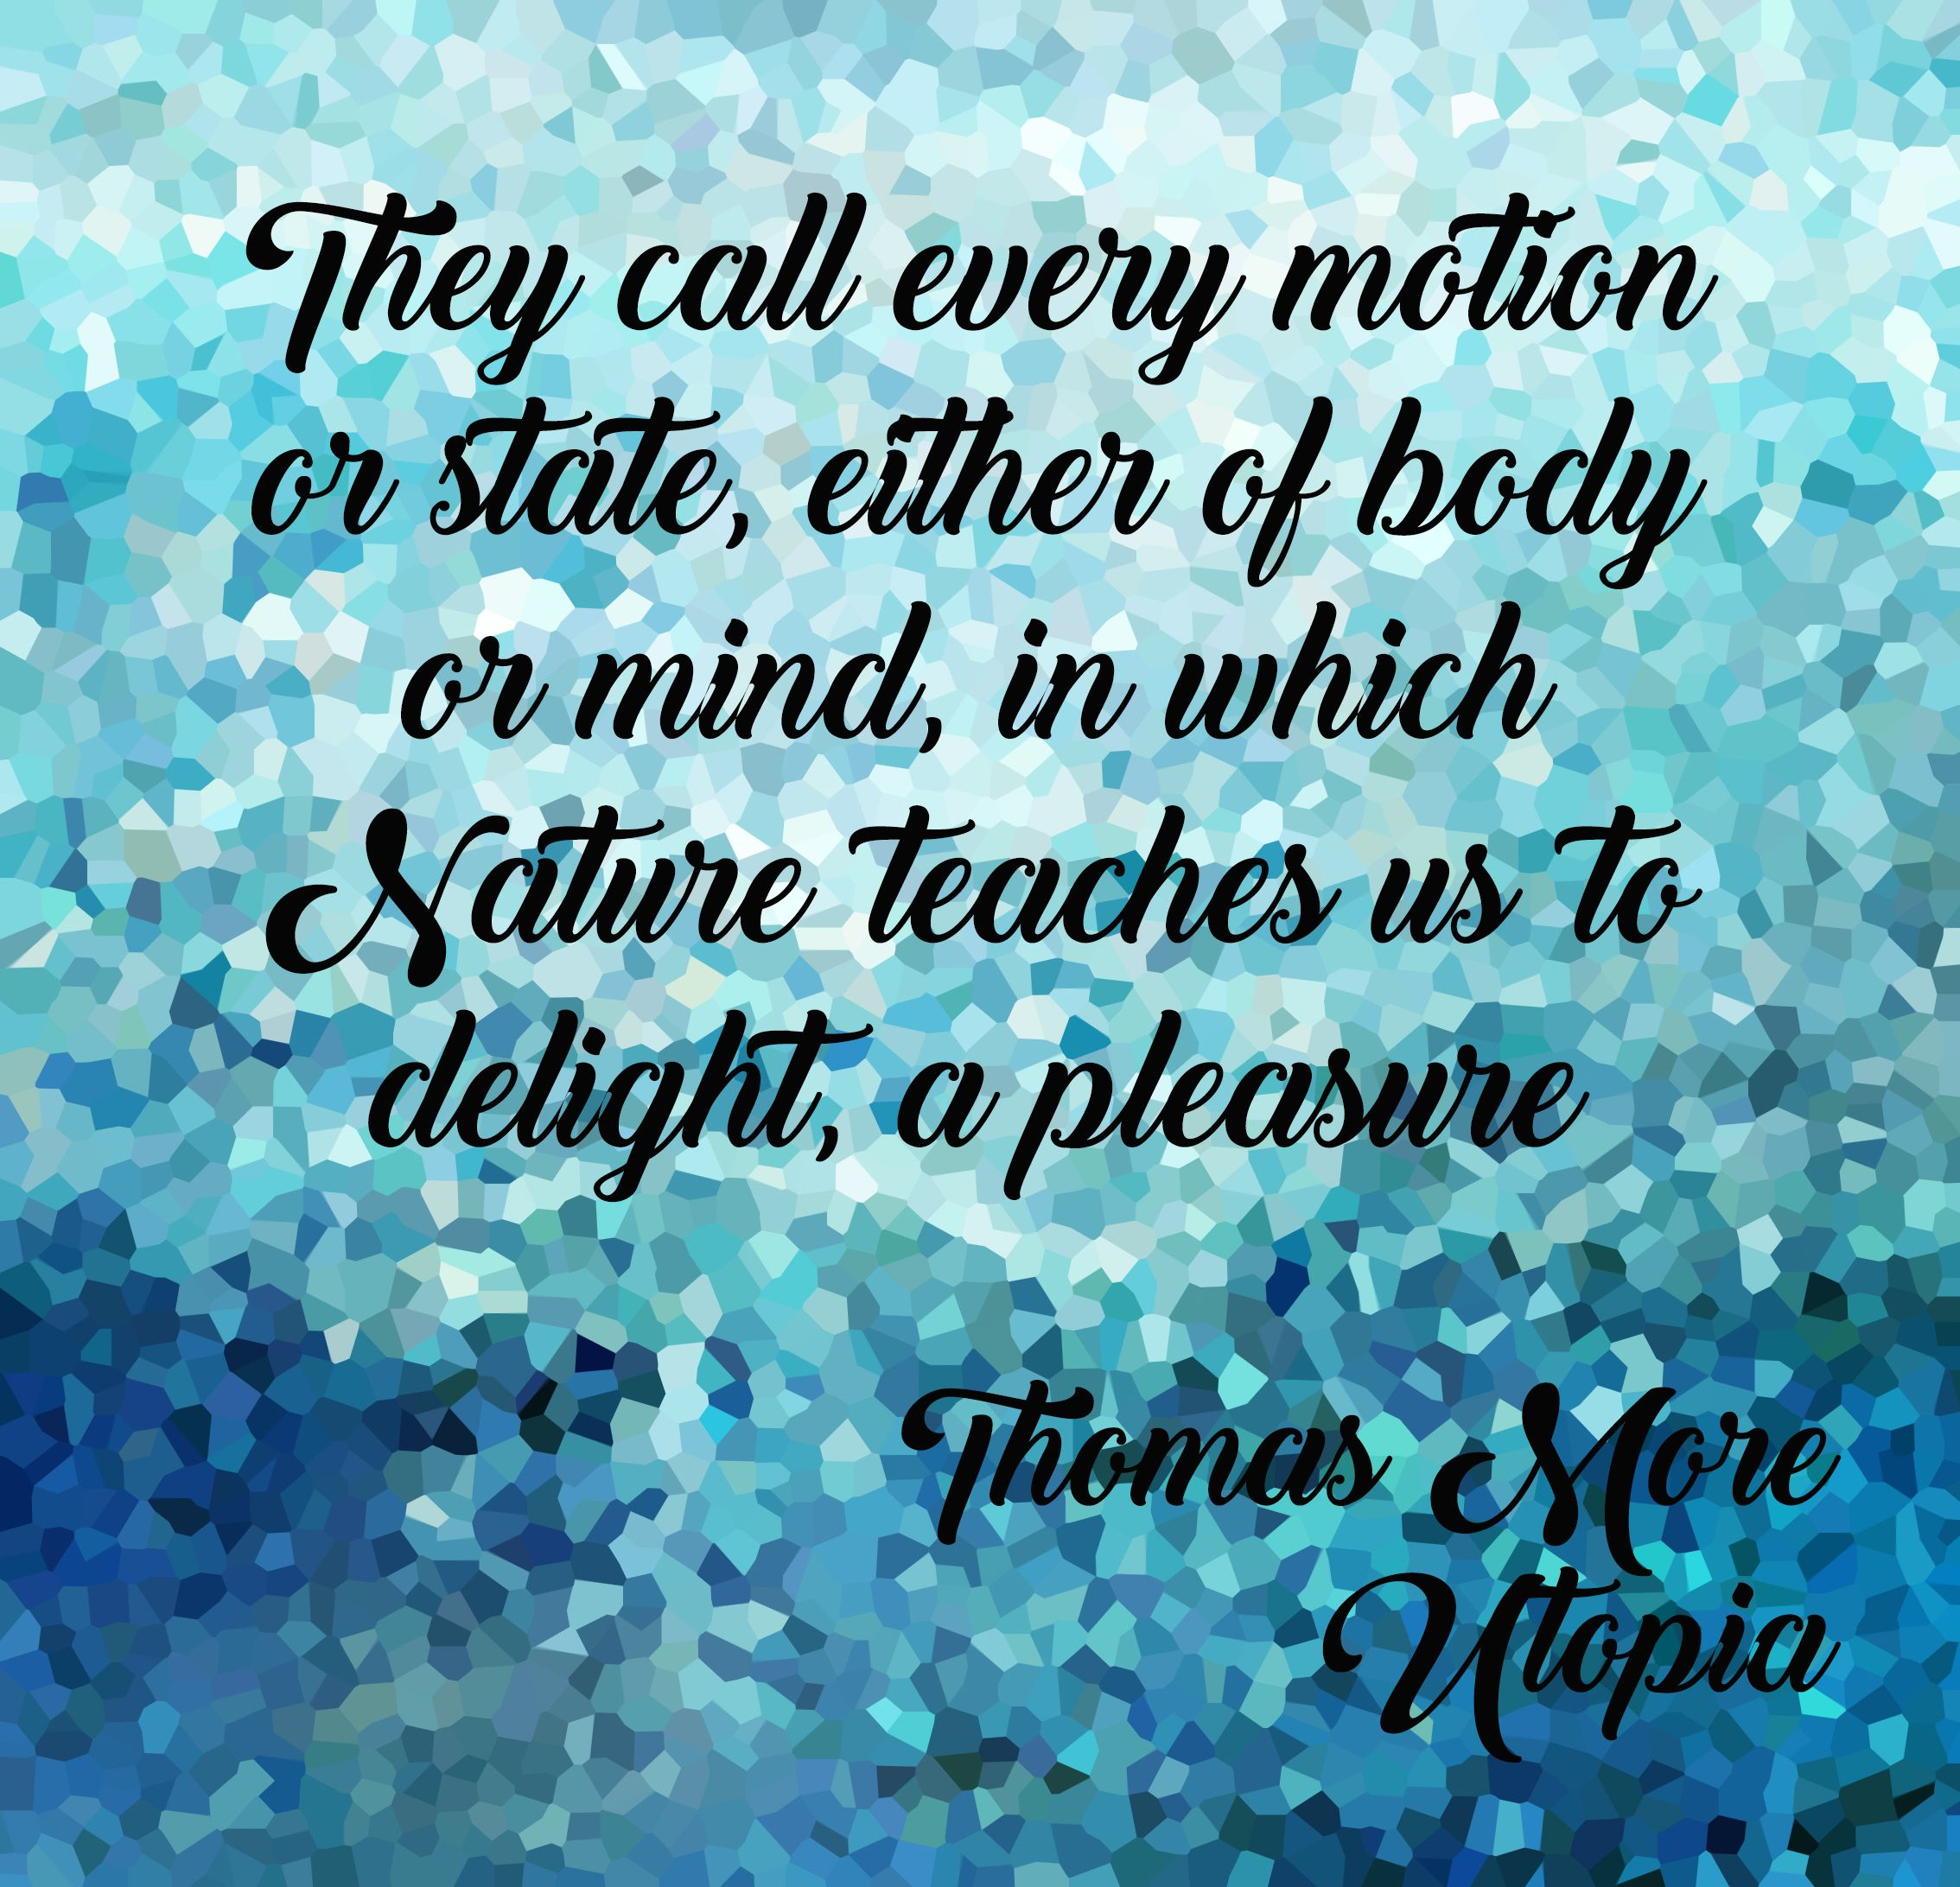 Thomas More Utopia Book